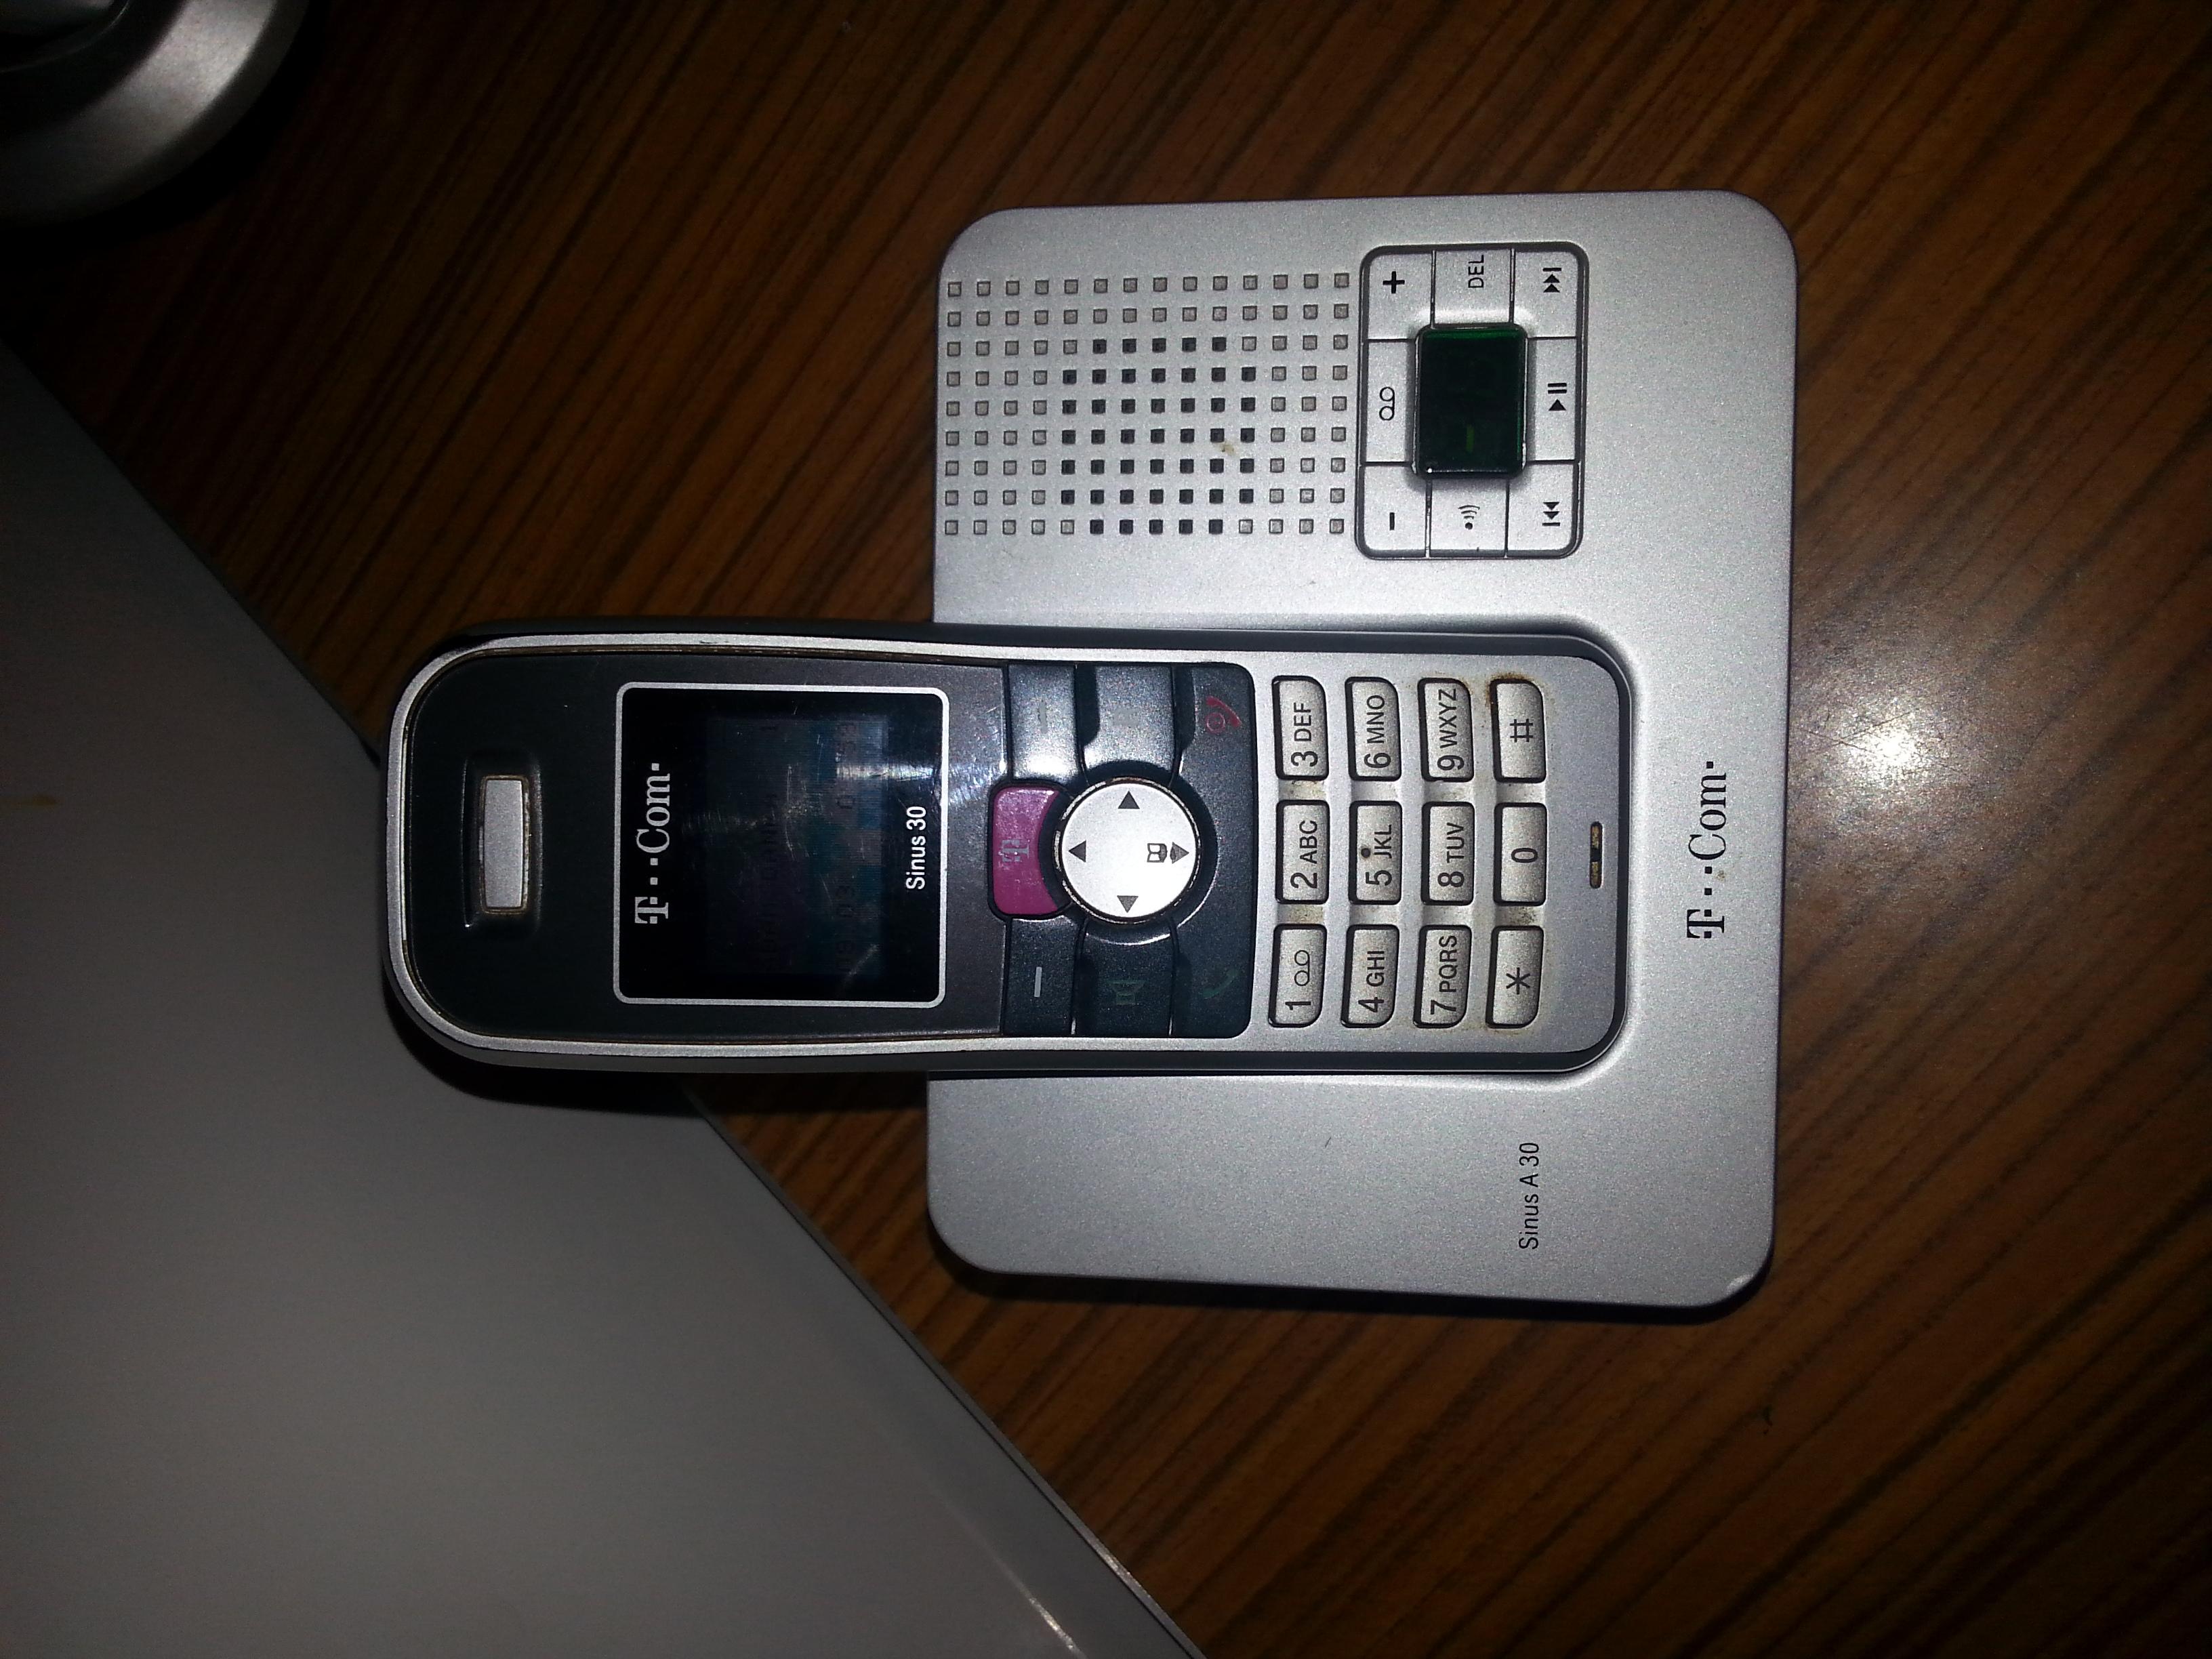 Szukam instrukcji obs�ugi do telefonu stacjonarnego T-COM sinus 30